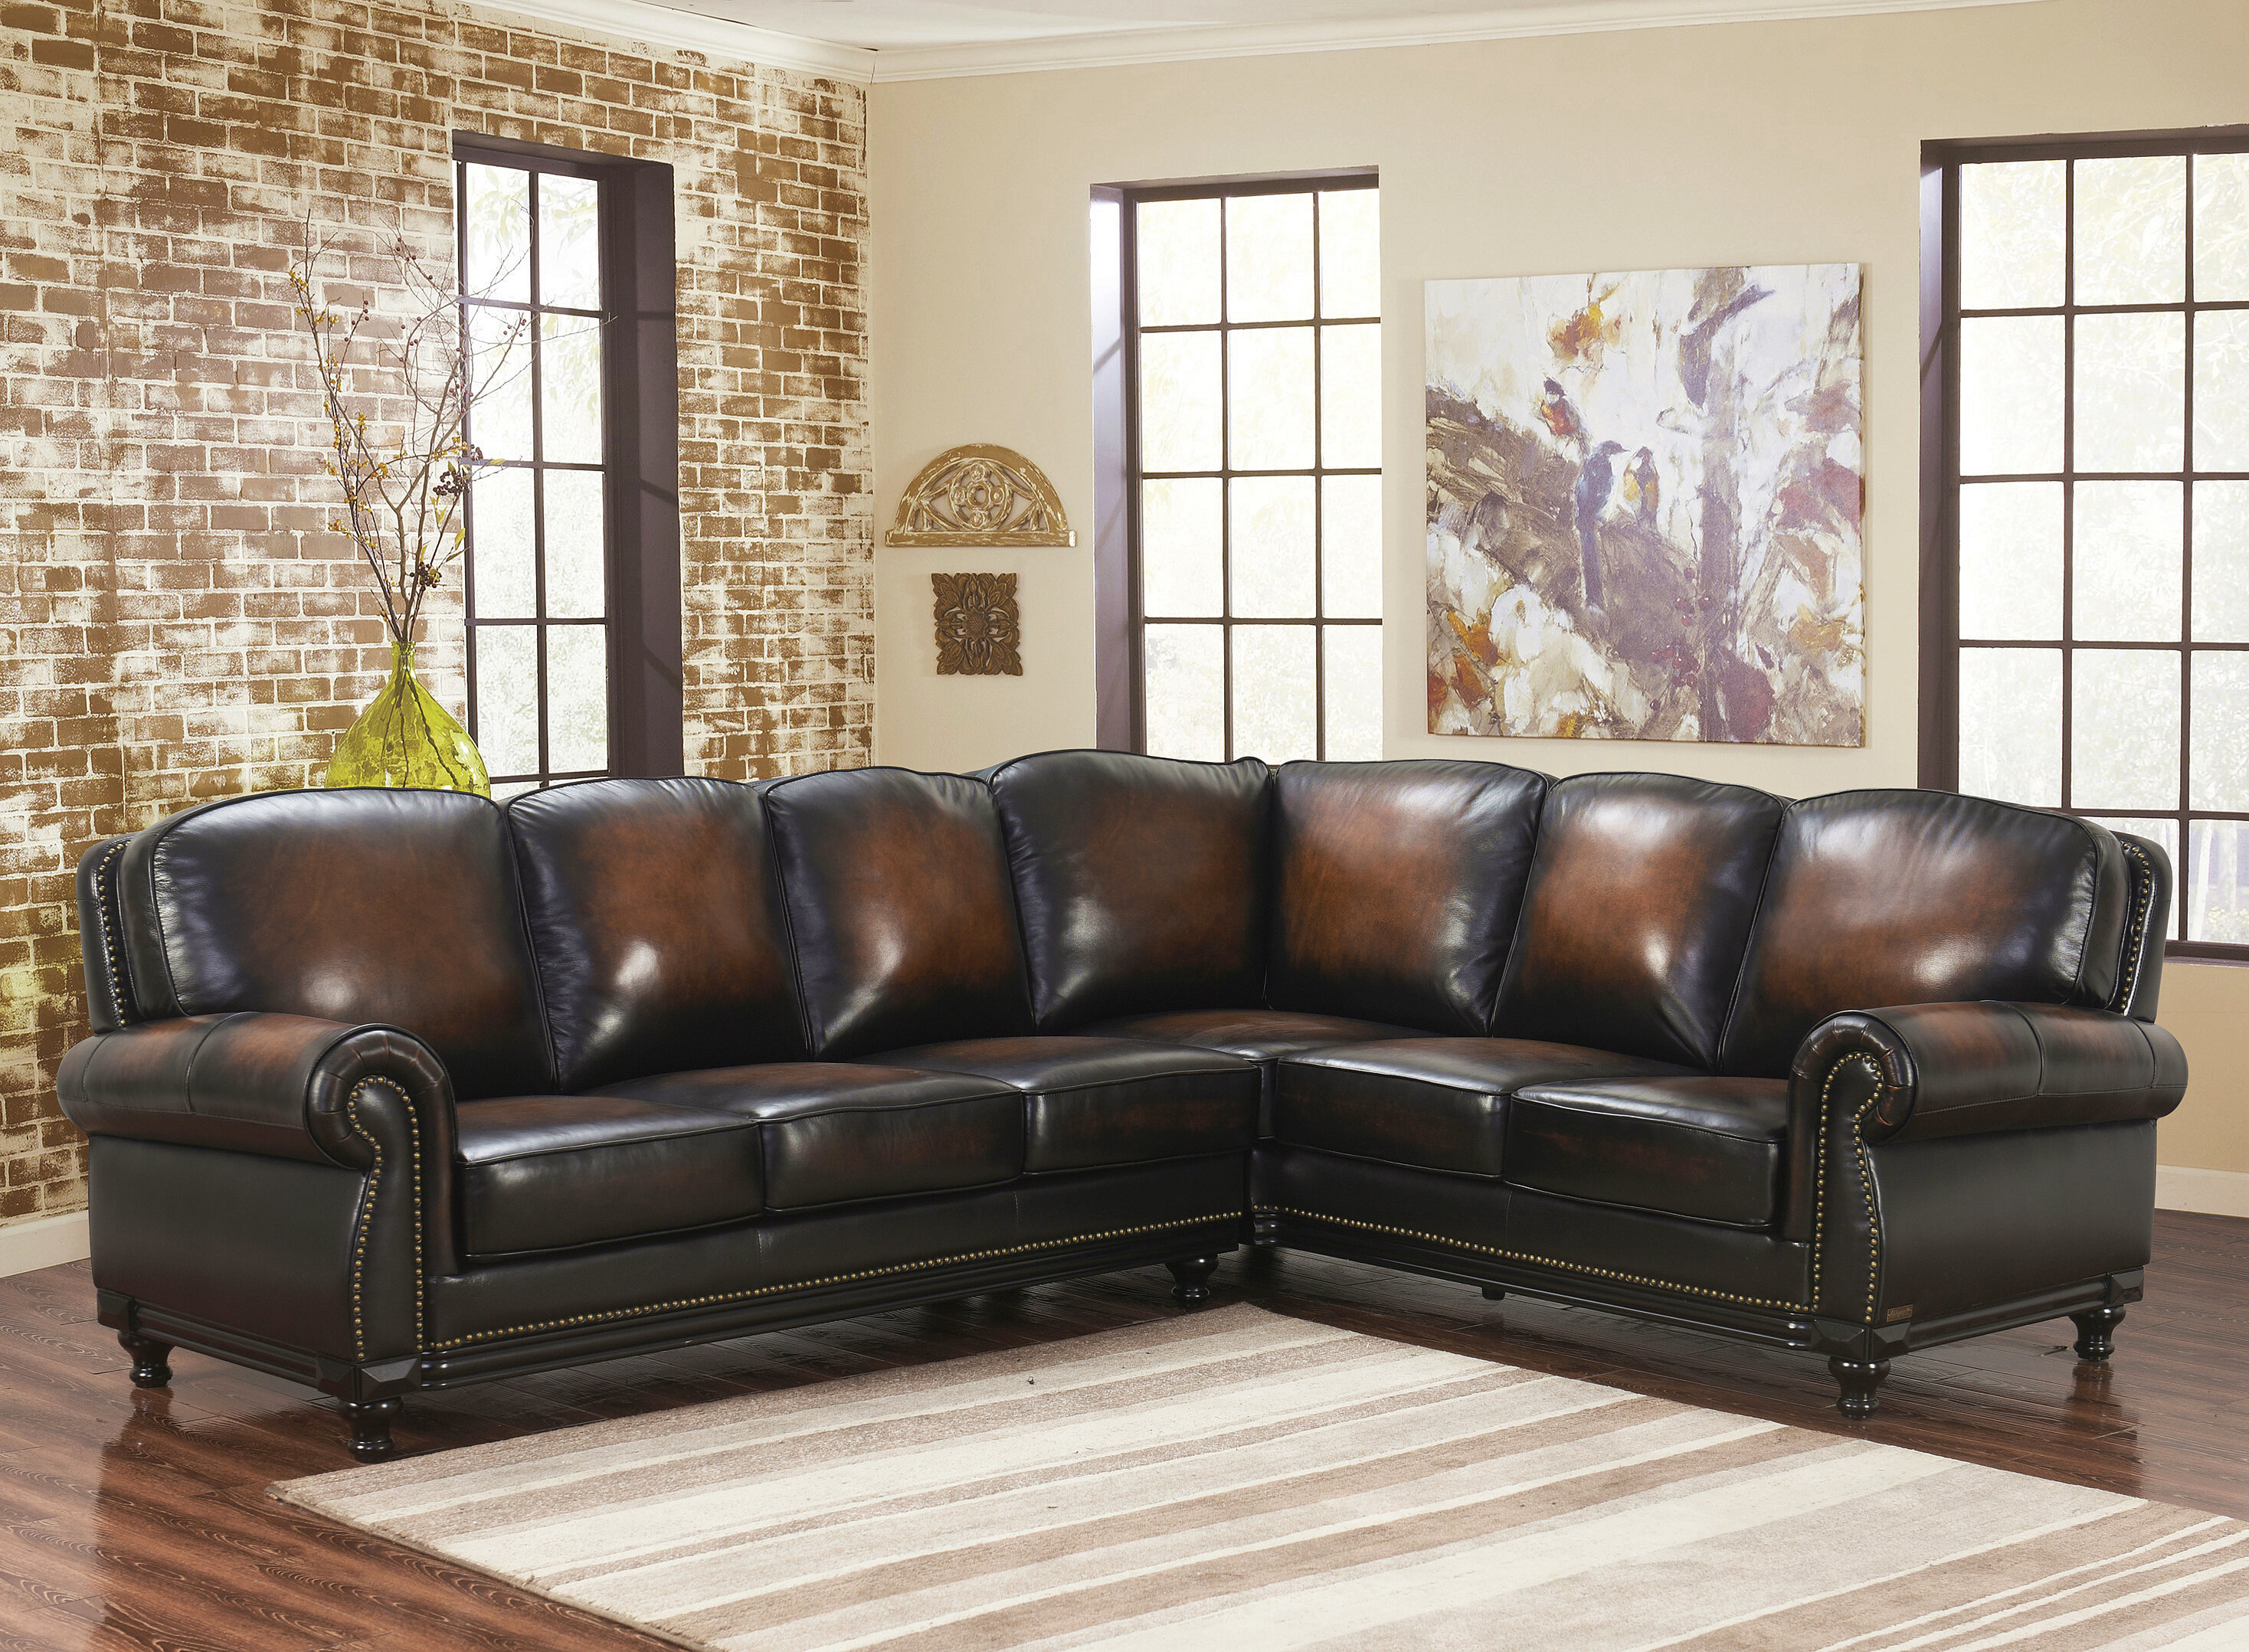 Boulton Leather Corner Sectional